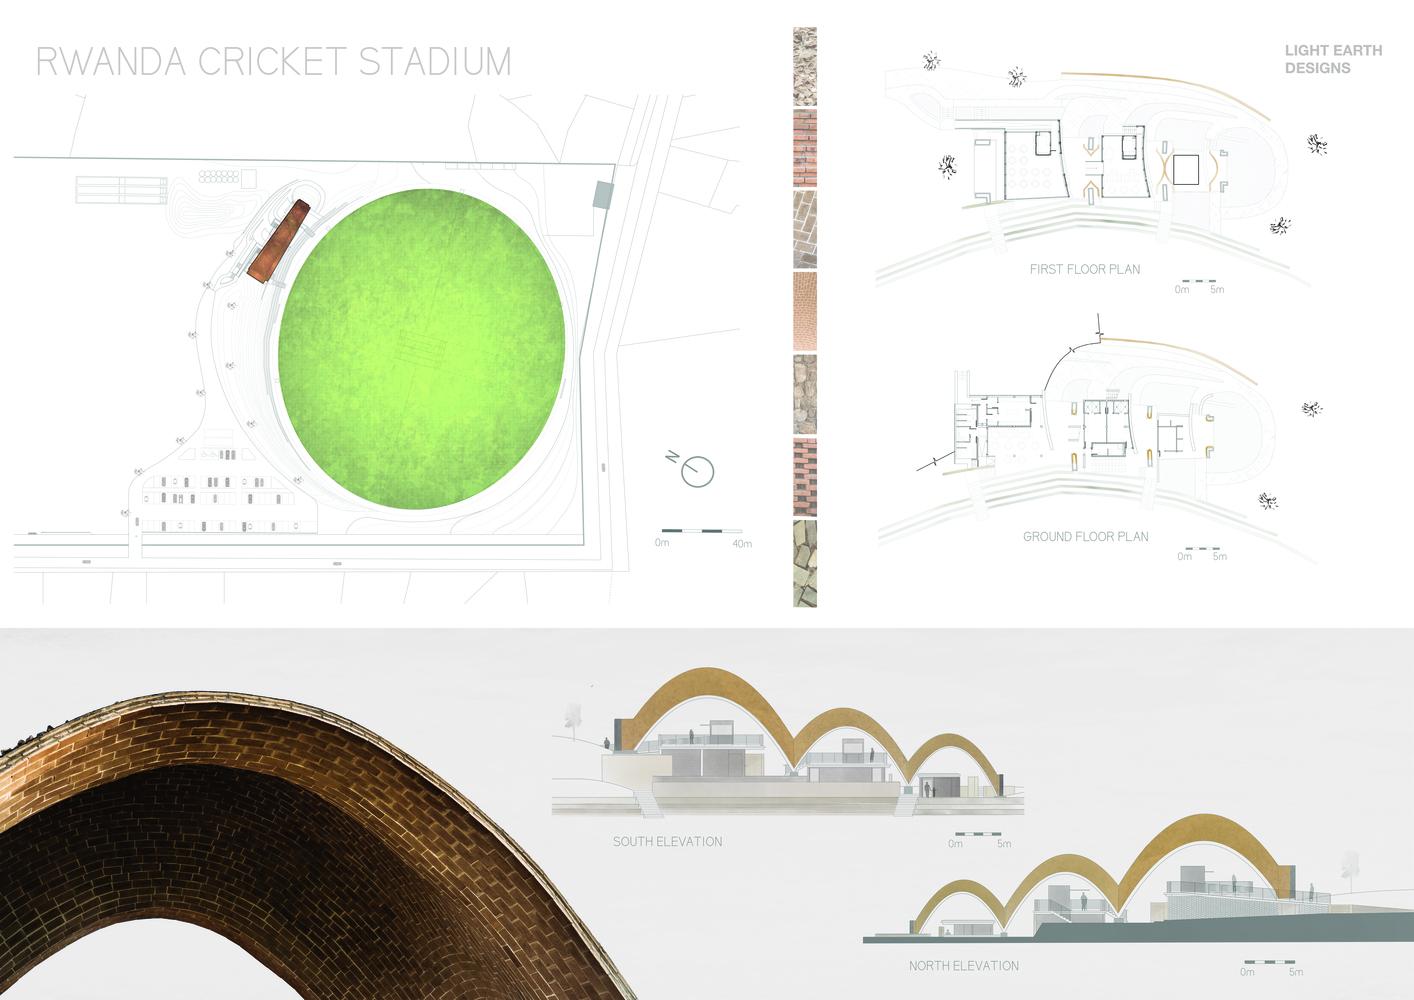 hight resolution of rwanda cricket stadium light earth designs